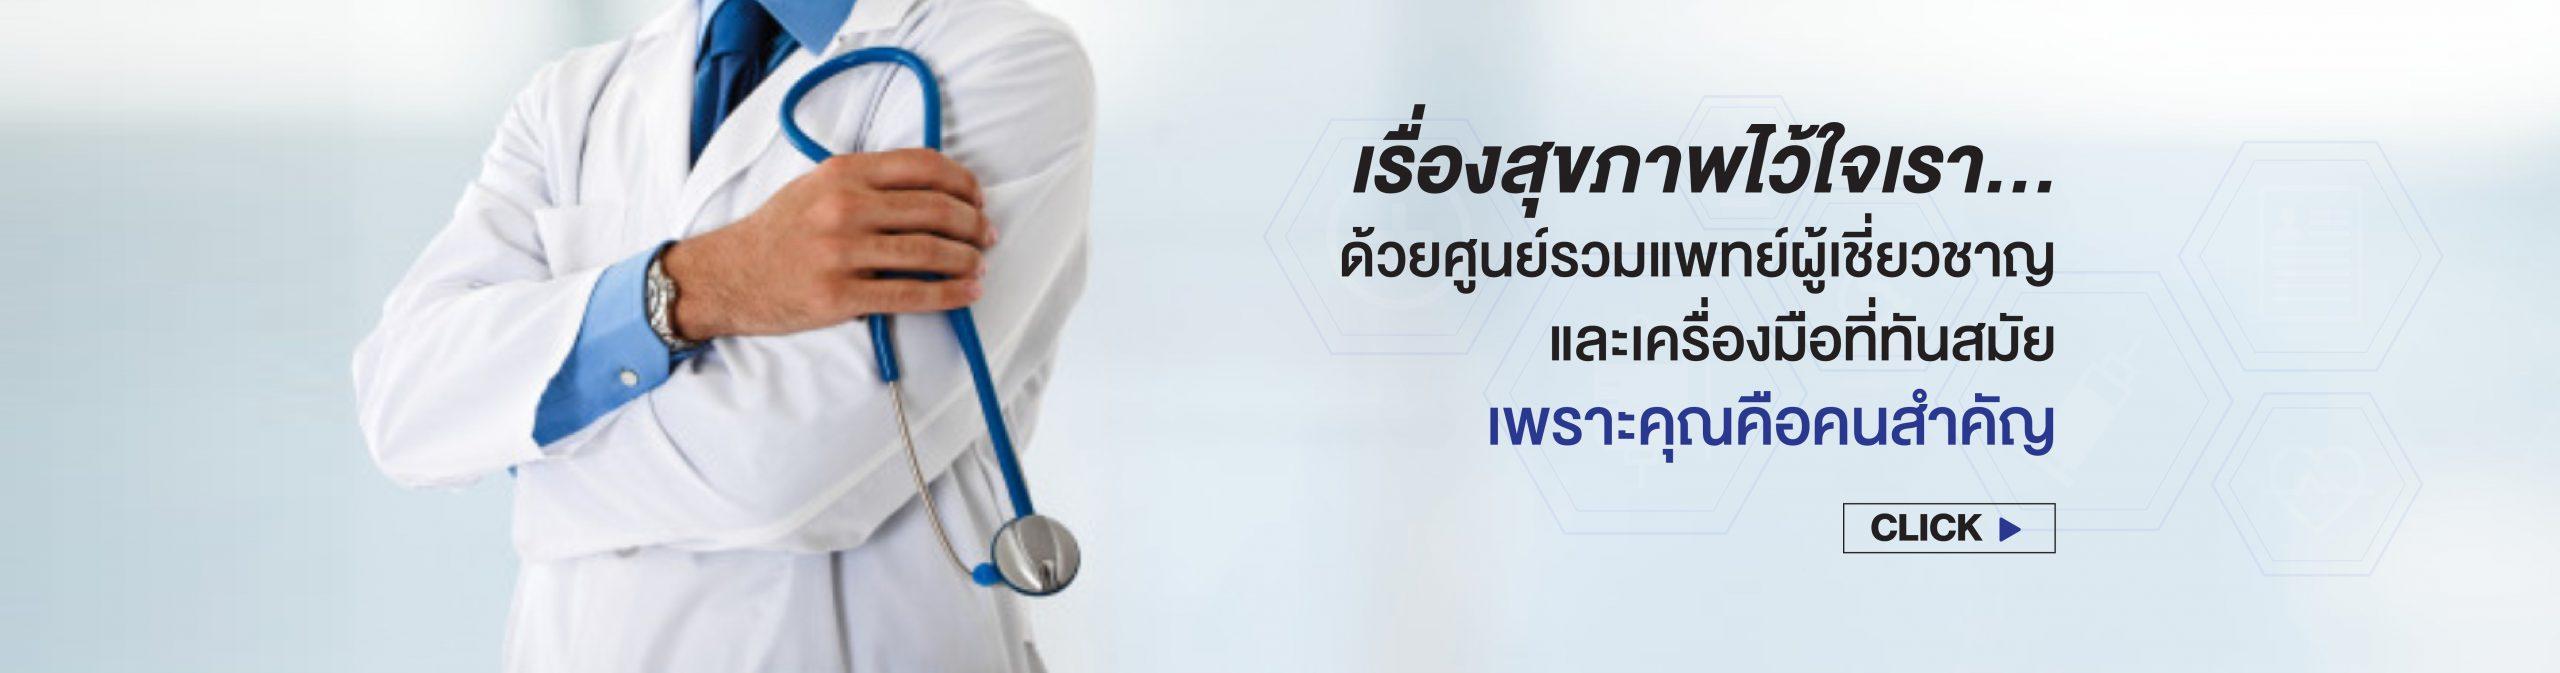 Medical-01-1